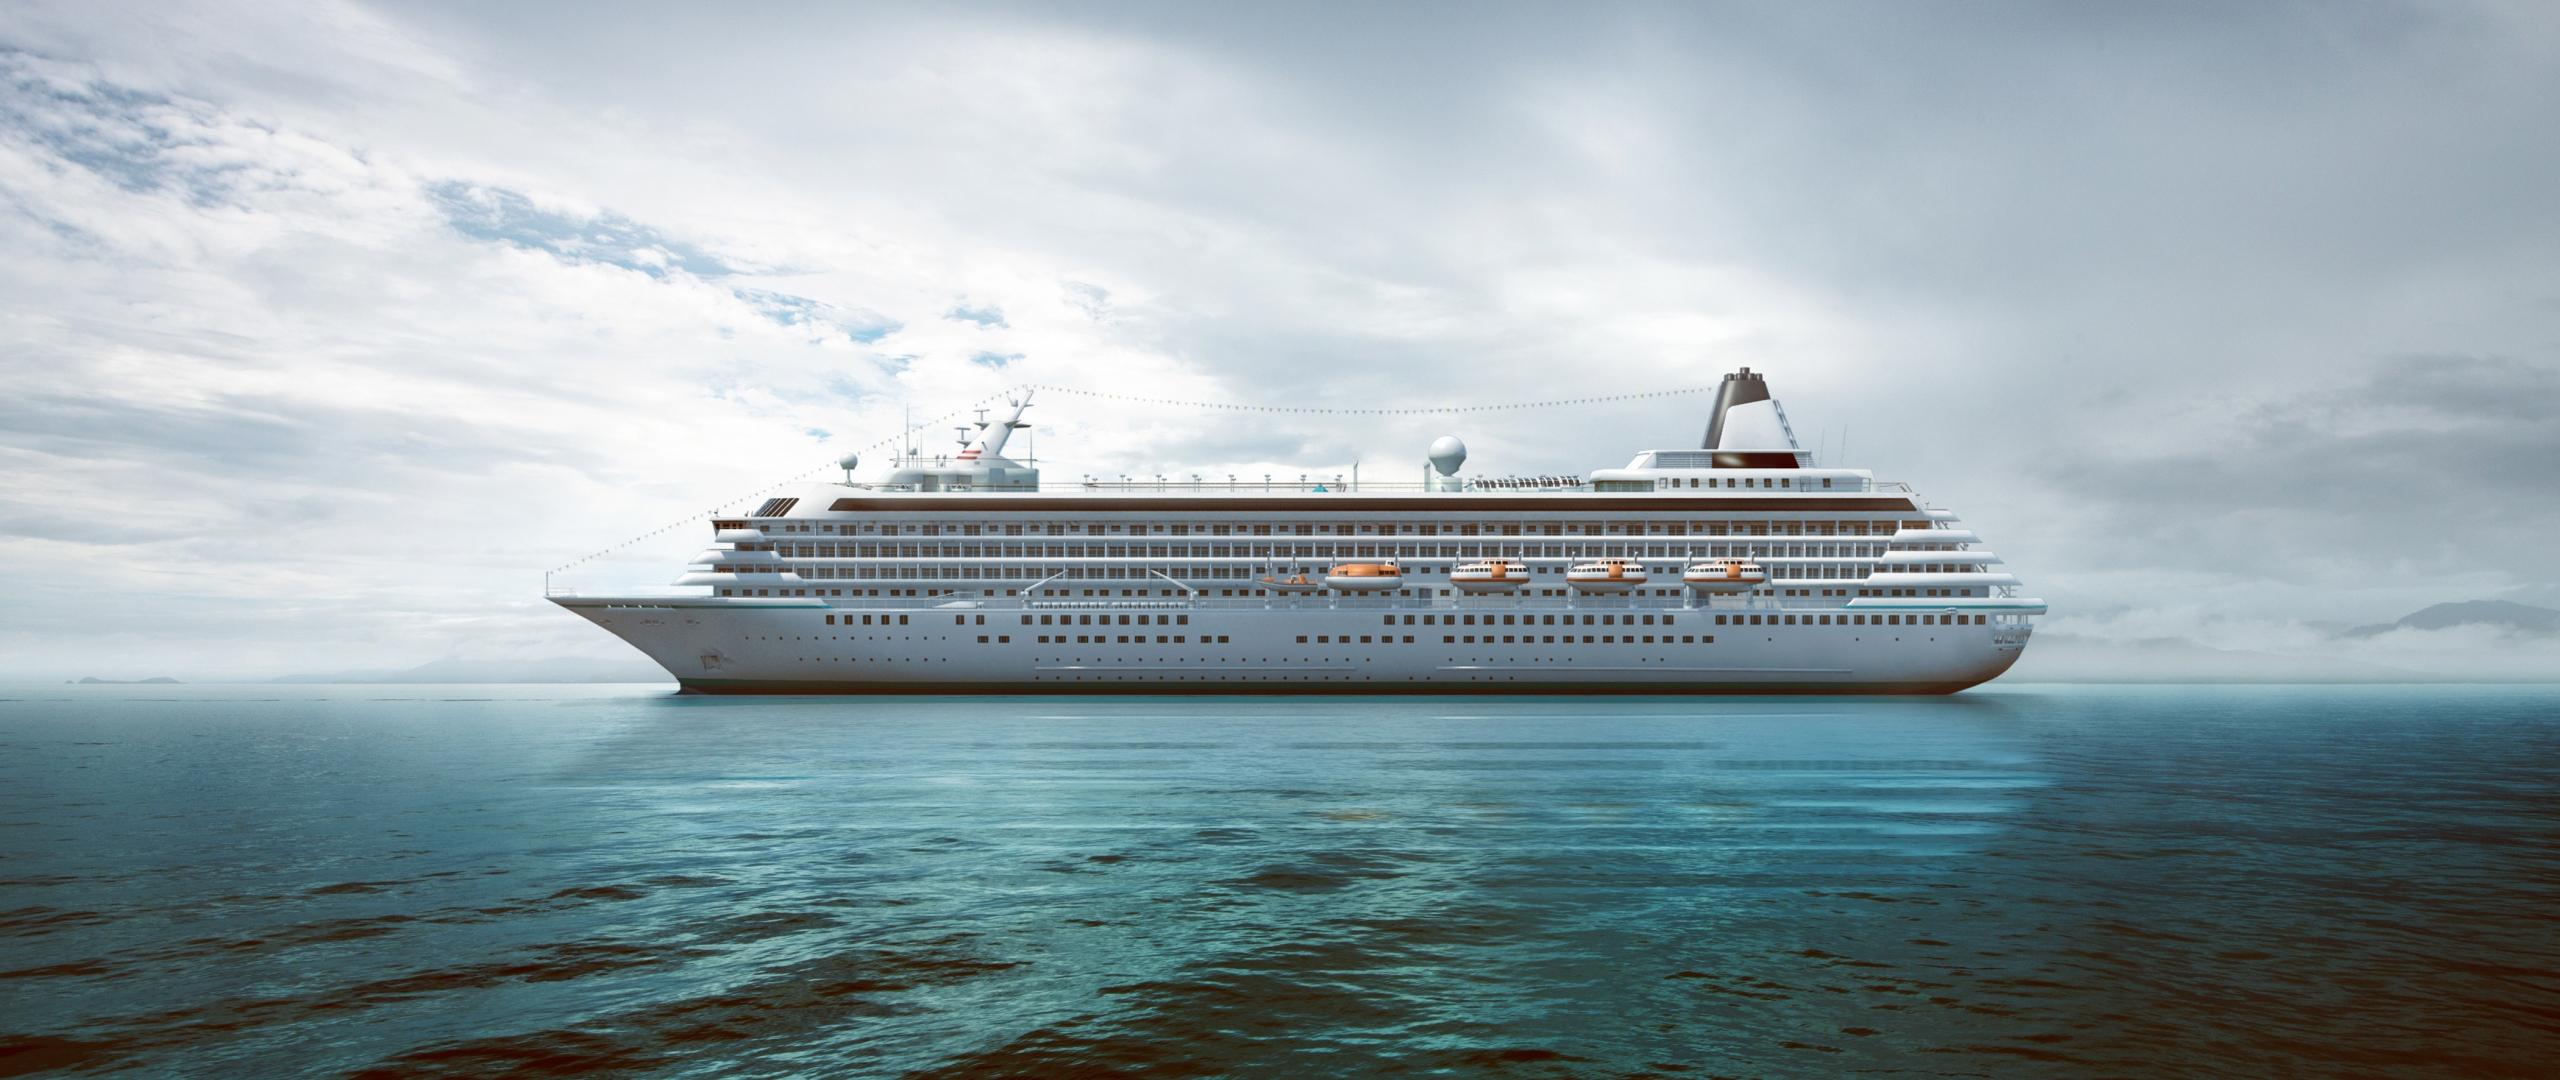 Wallpaper Cruise Ship Vehicles Sea 4k 2560x1080 Download Hd Wallpaper Wallpapertip